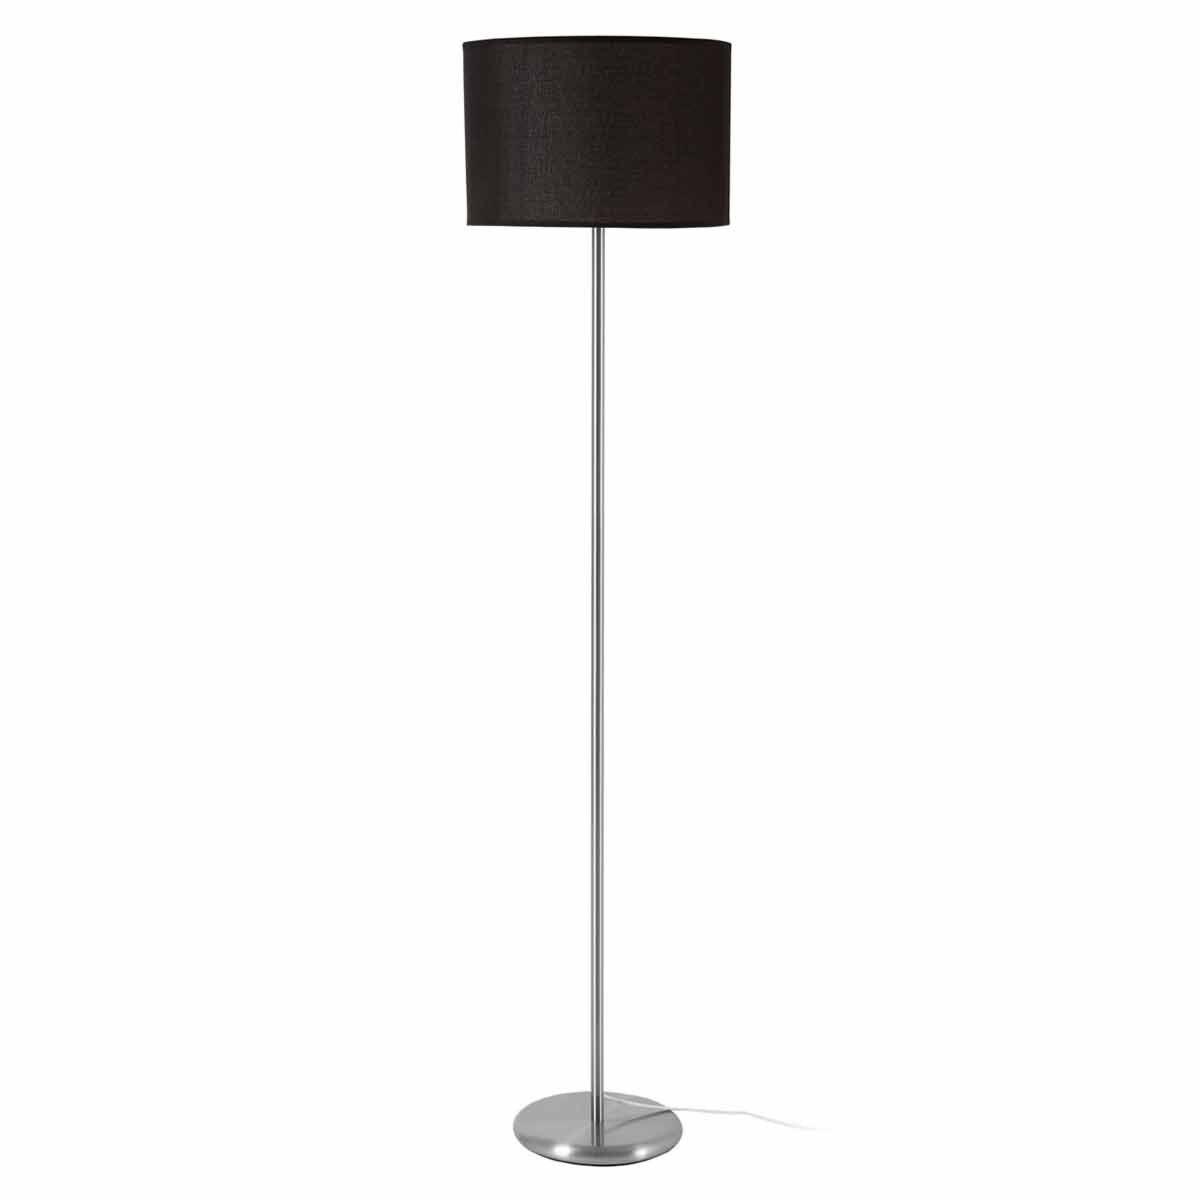 Premier Housewares Forma Chrome Effect Floor Lamp